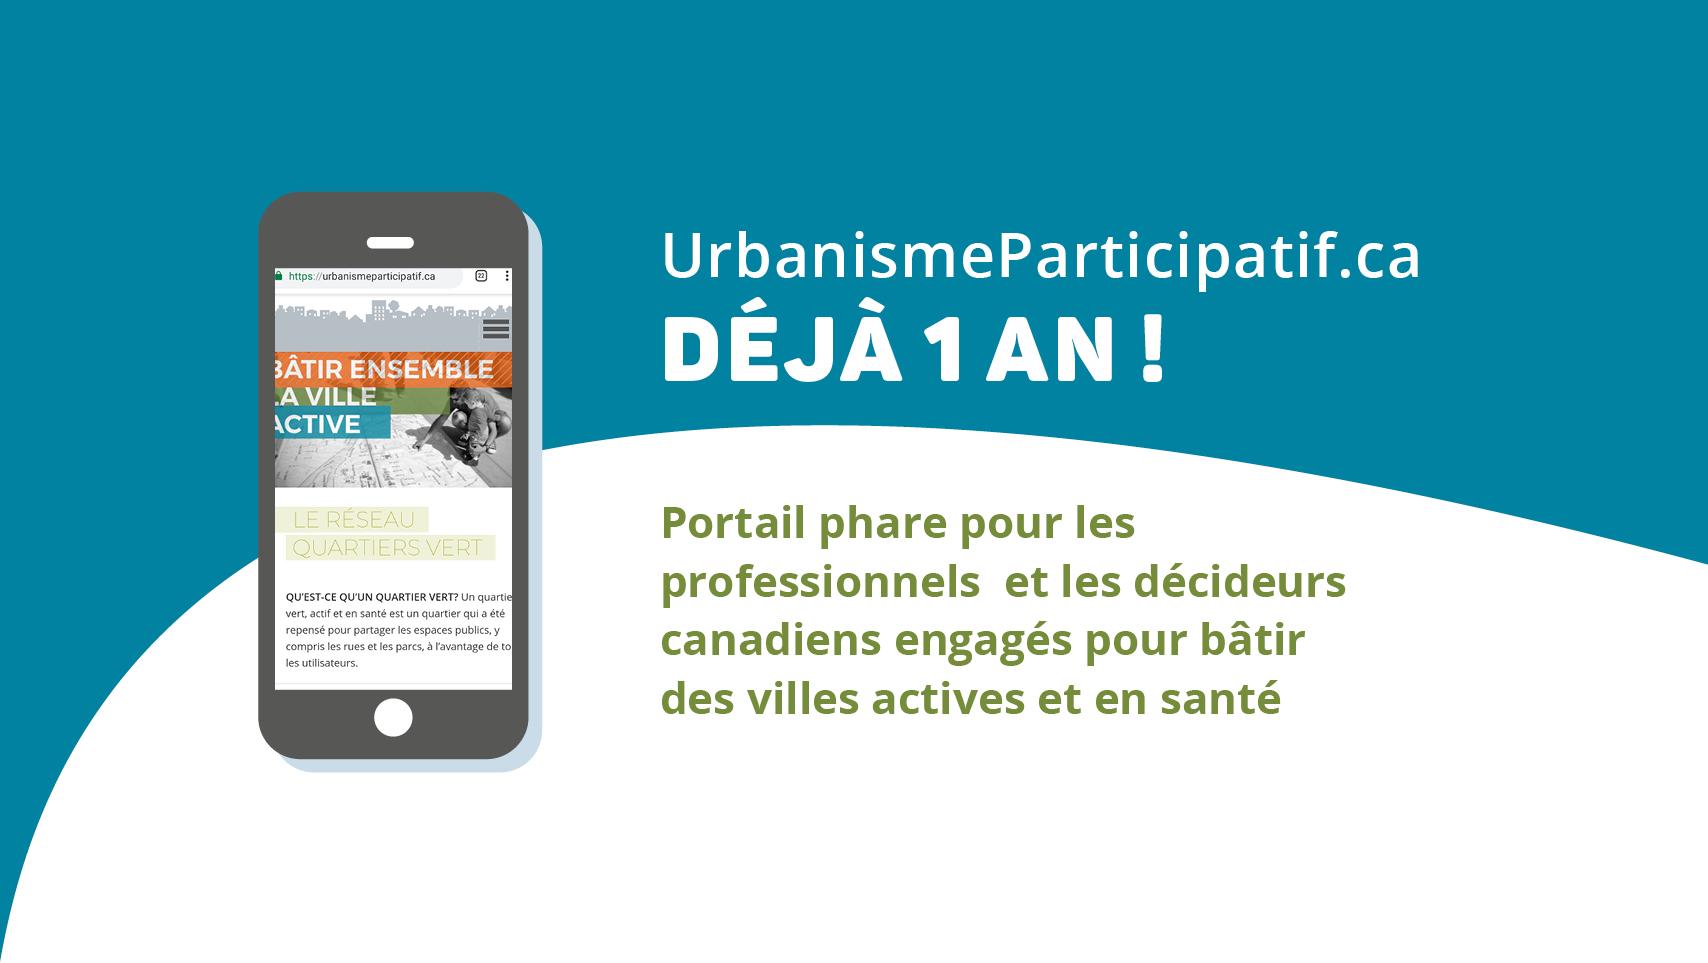 1 an urbanisme participatif